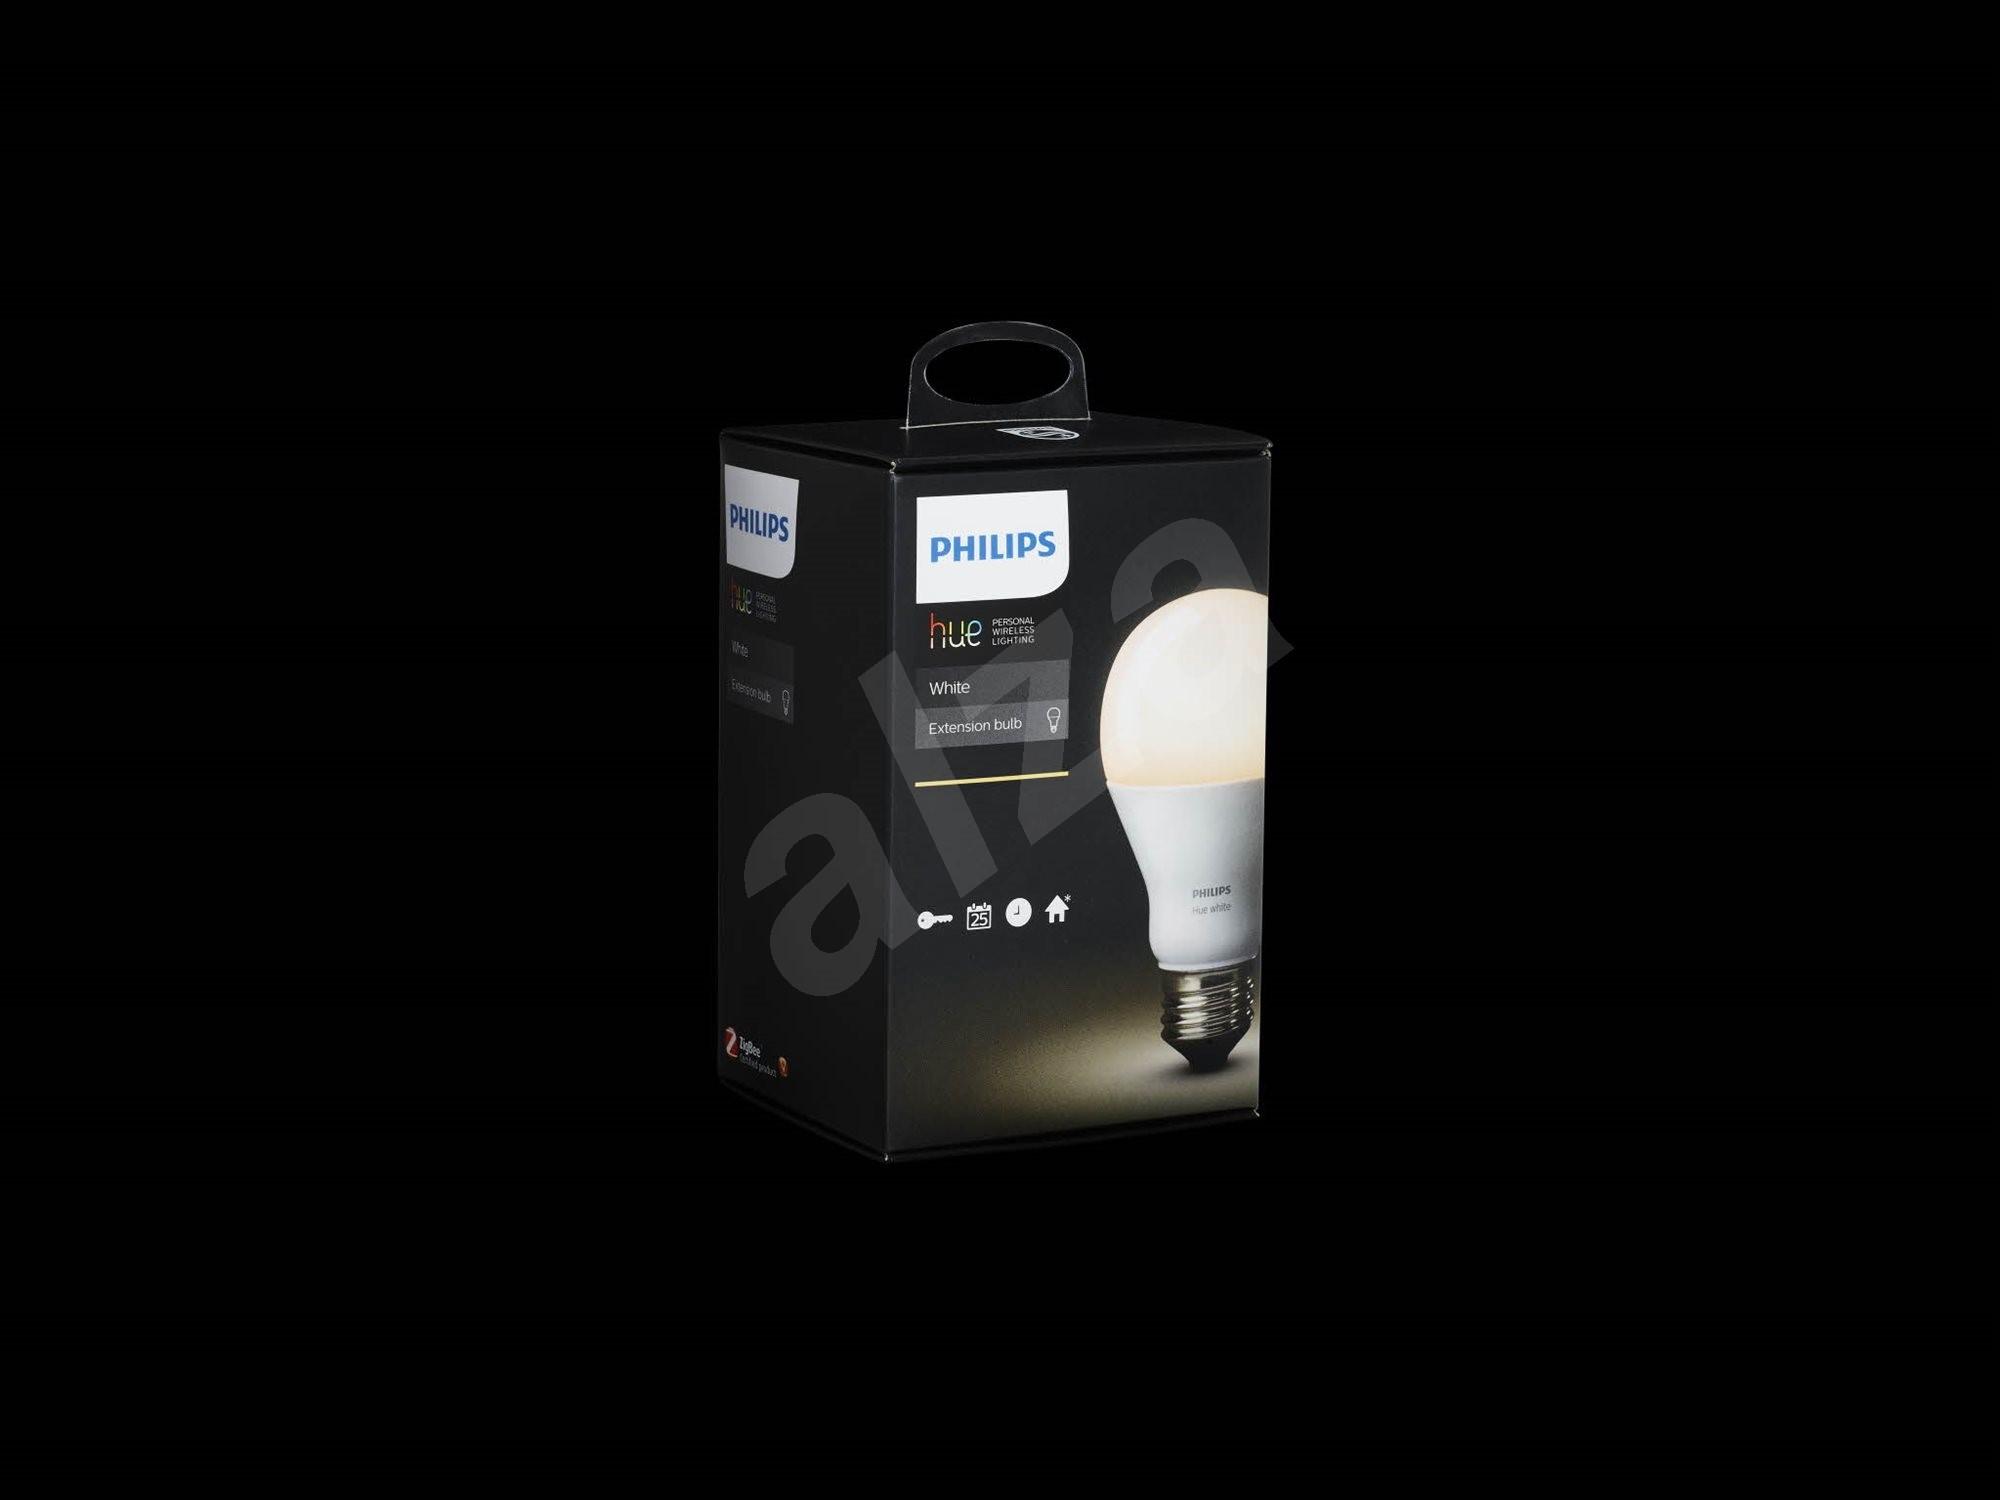 philips hue white 9 5w e27 led bulb. Black Bedroom Furniture Sets. Home Design Ideas